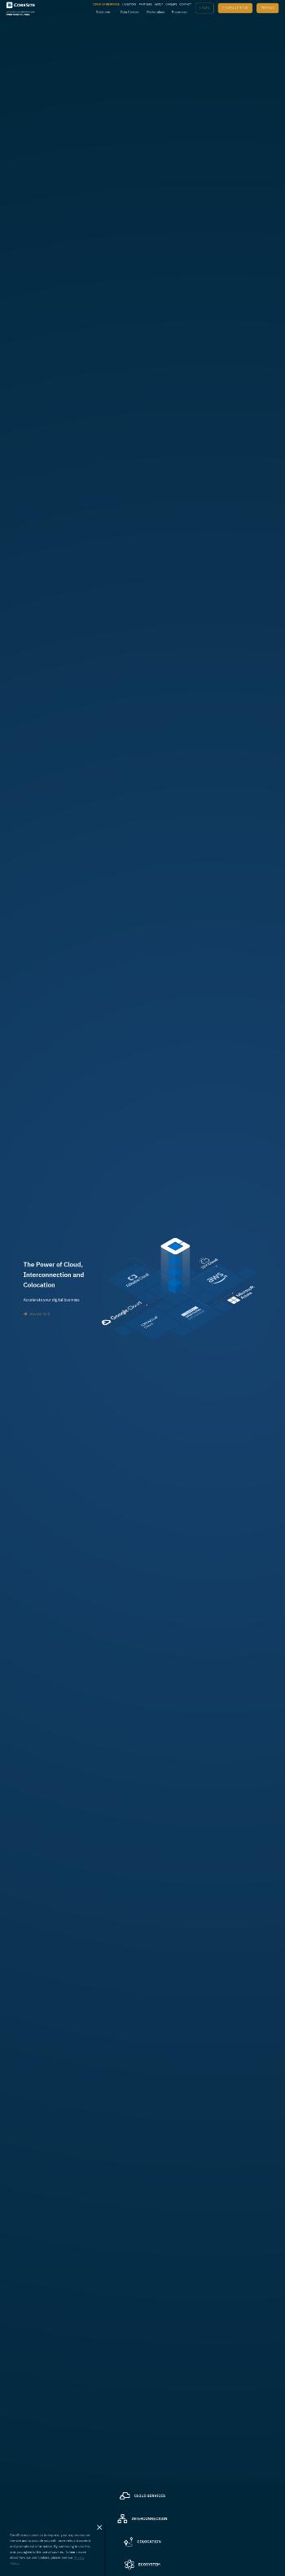 CoreSite Realty Corporation Website Screenshot